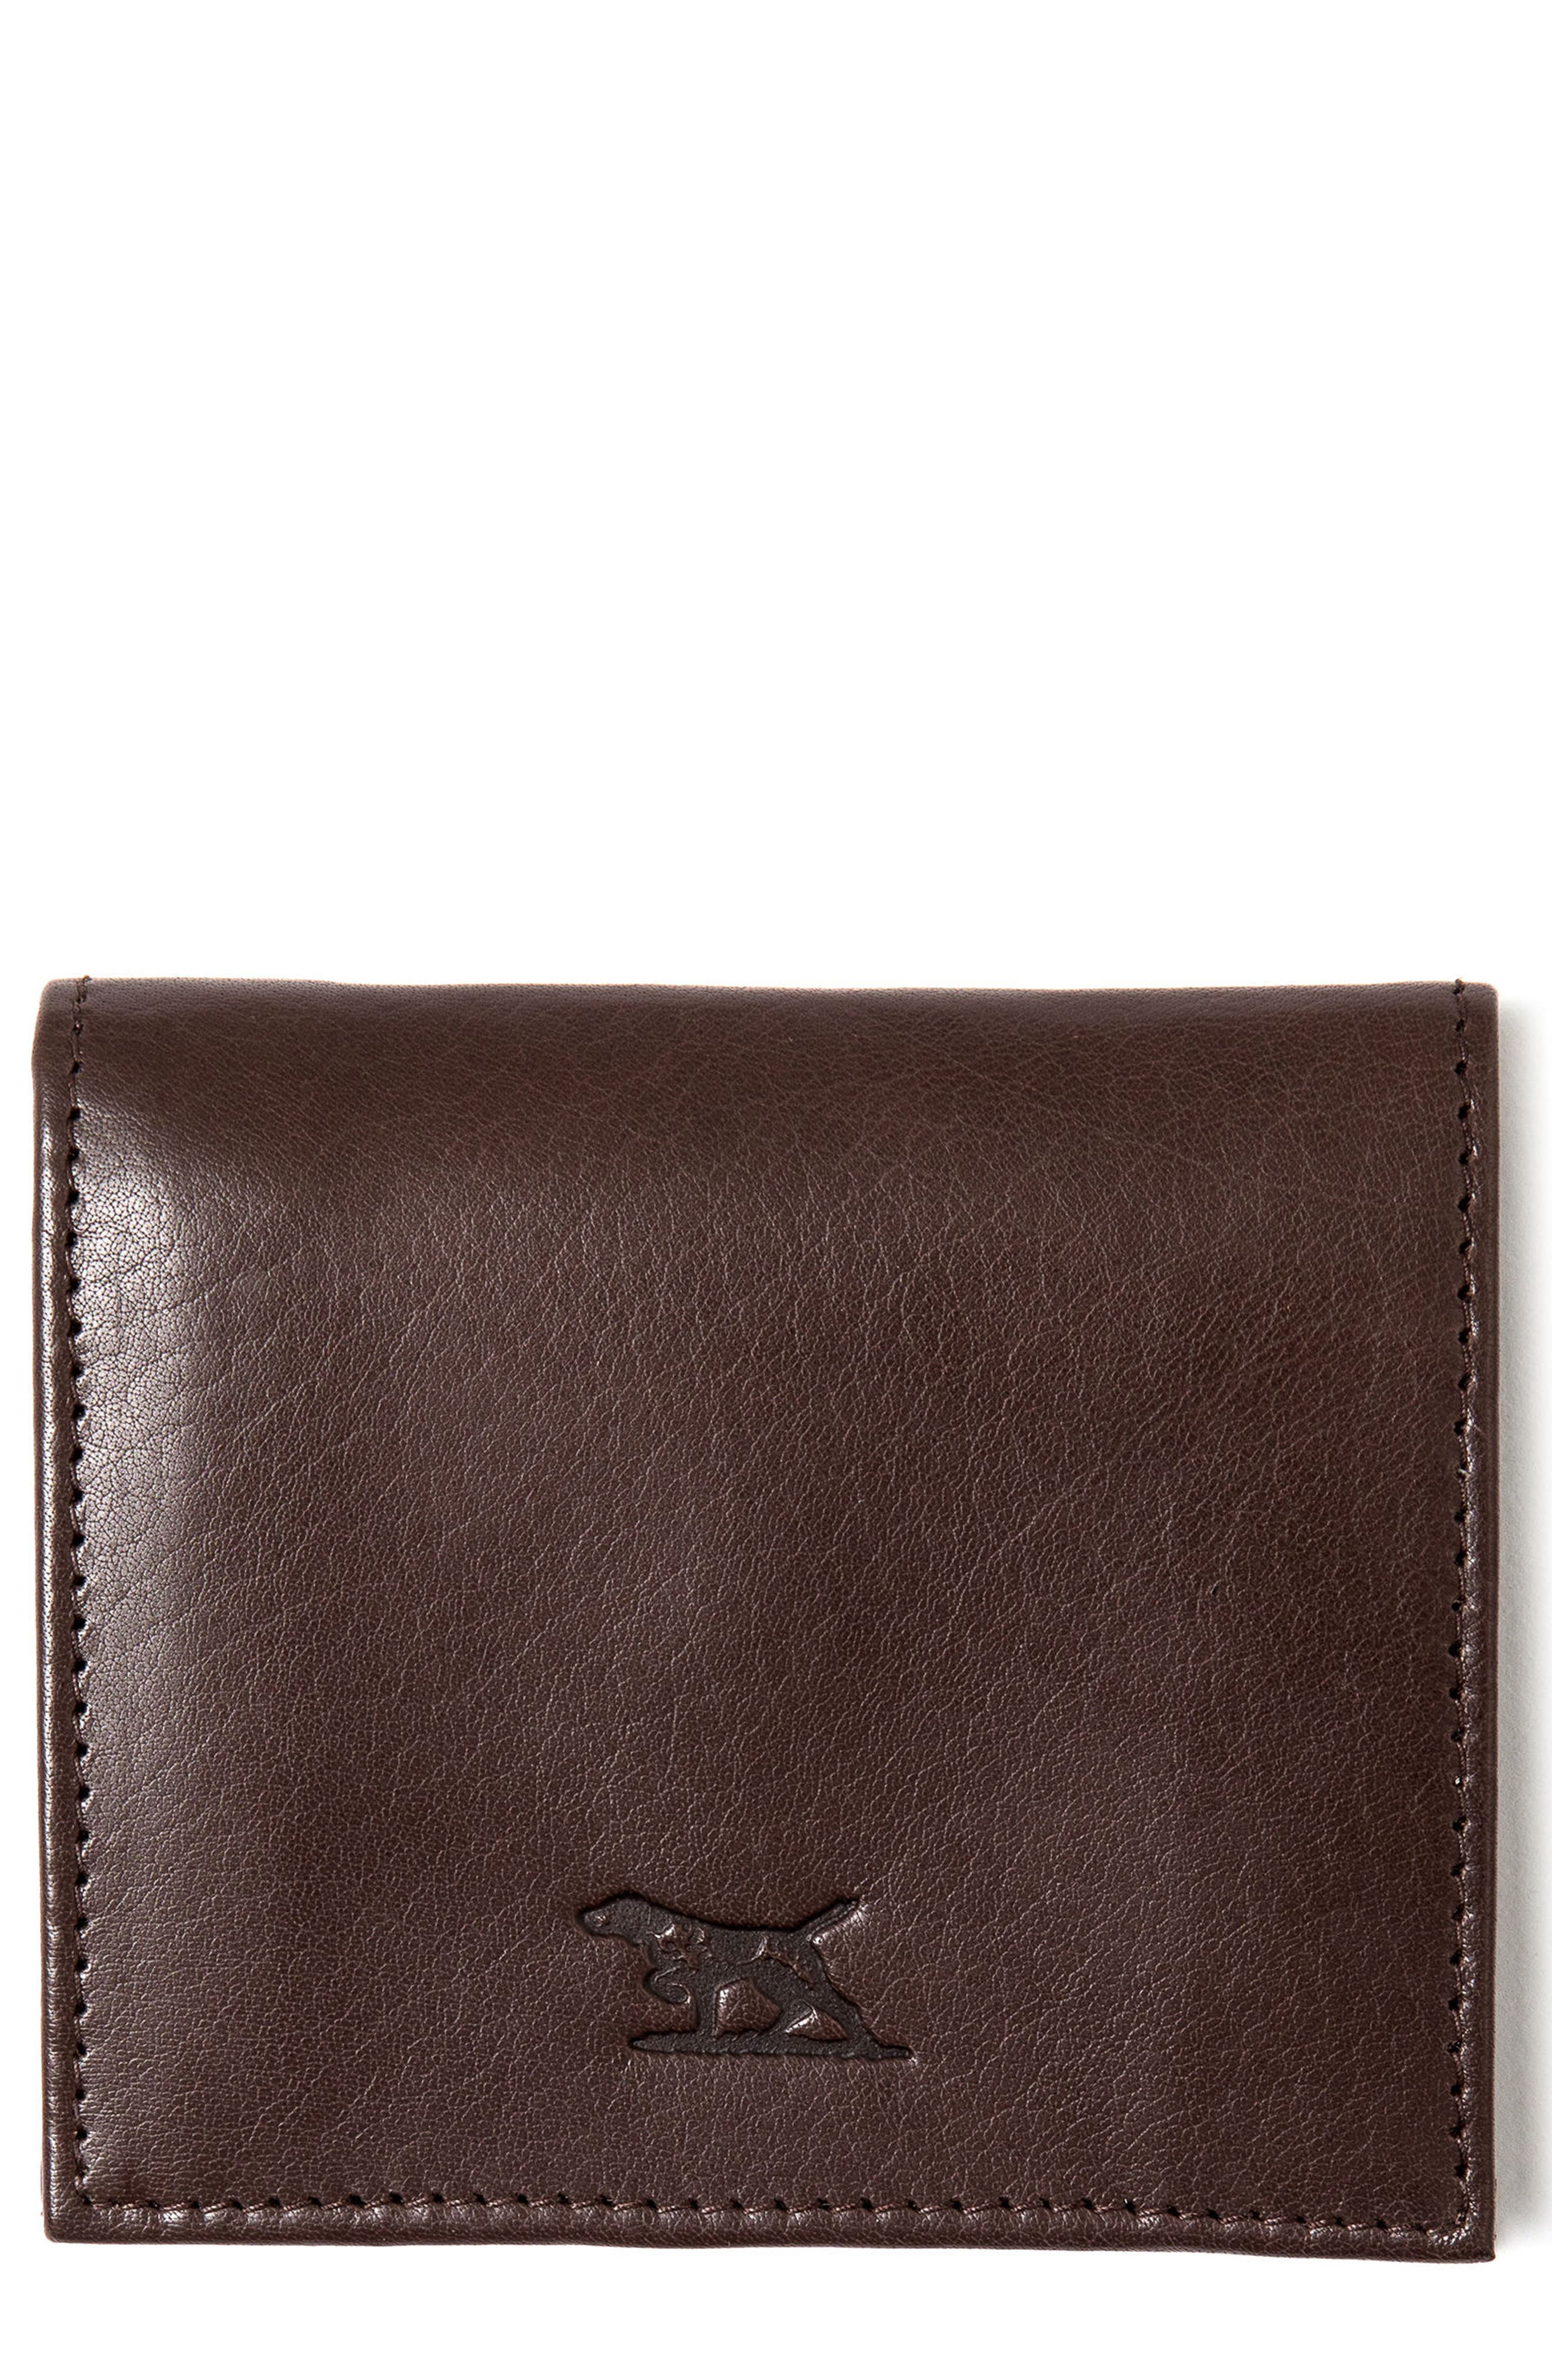 Main Image - Rodd & Gunn Highbank Station Leather Wallet